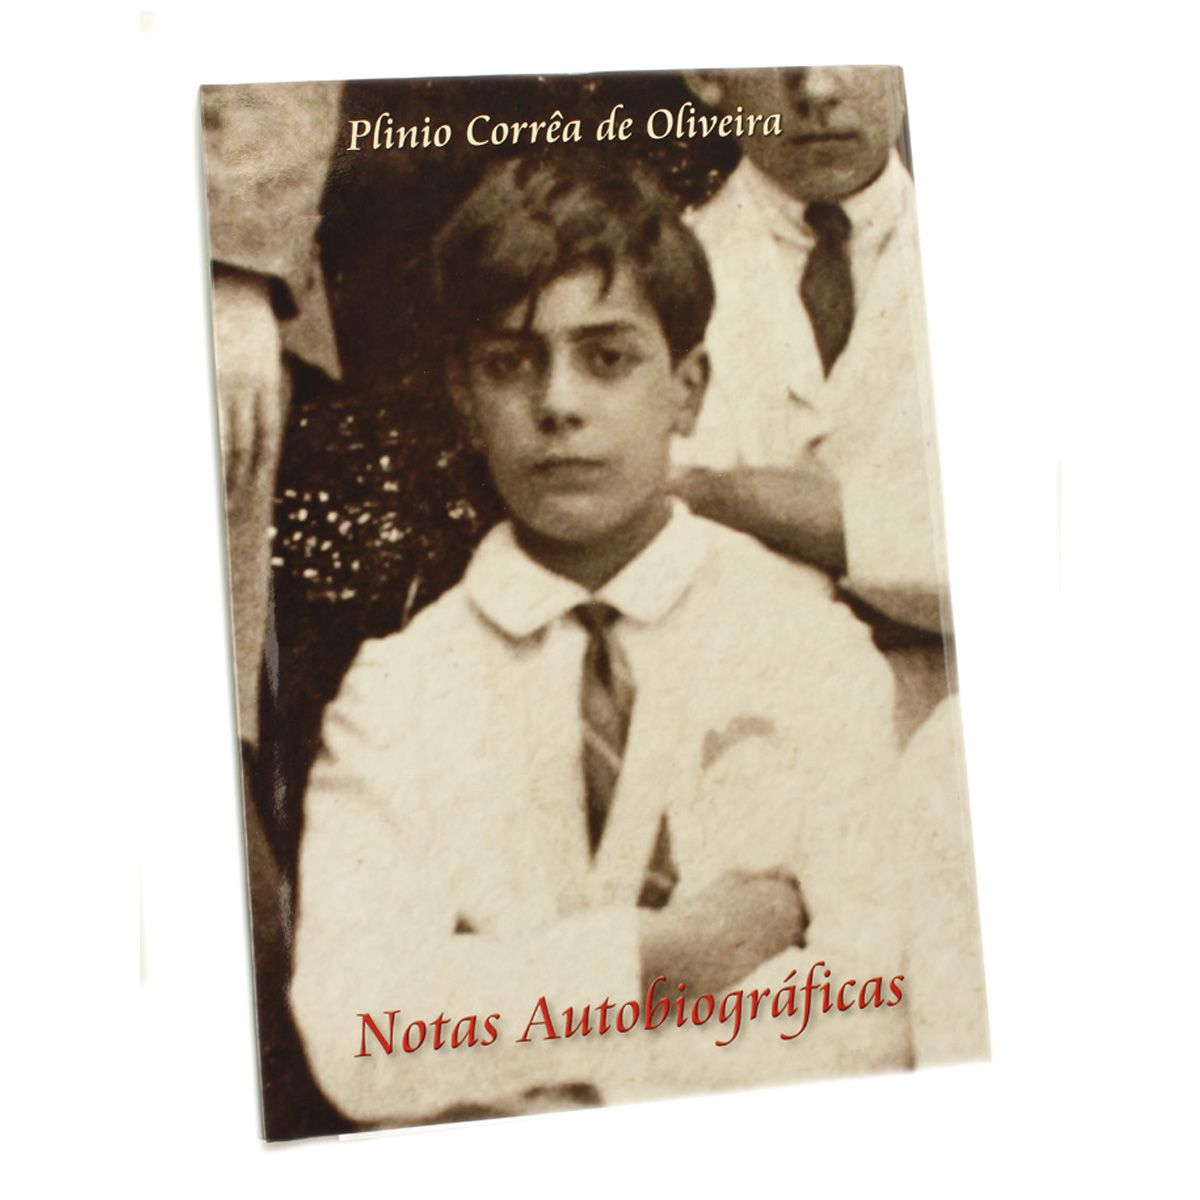 Livro - Notas Autobiográficas de Plinio Correa de Oliveira - Vol III